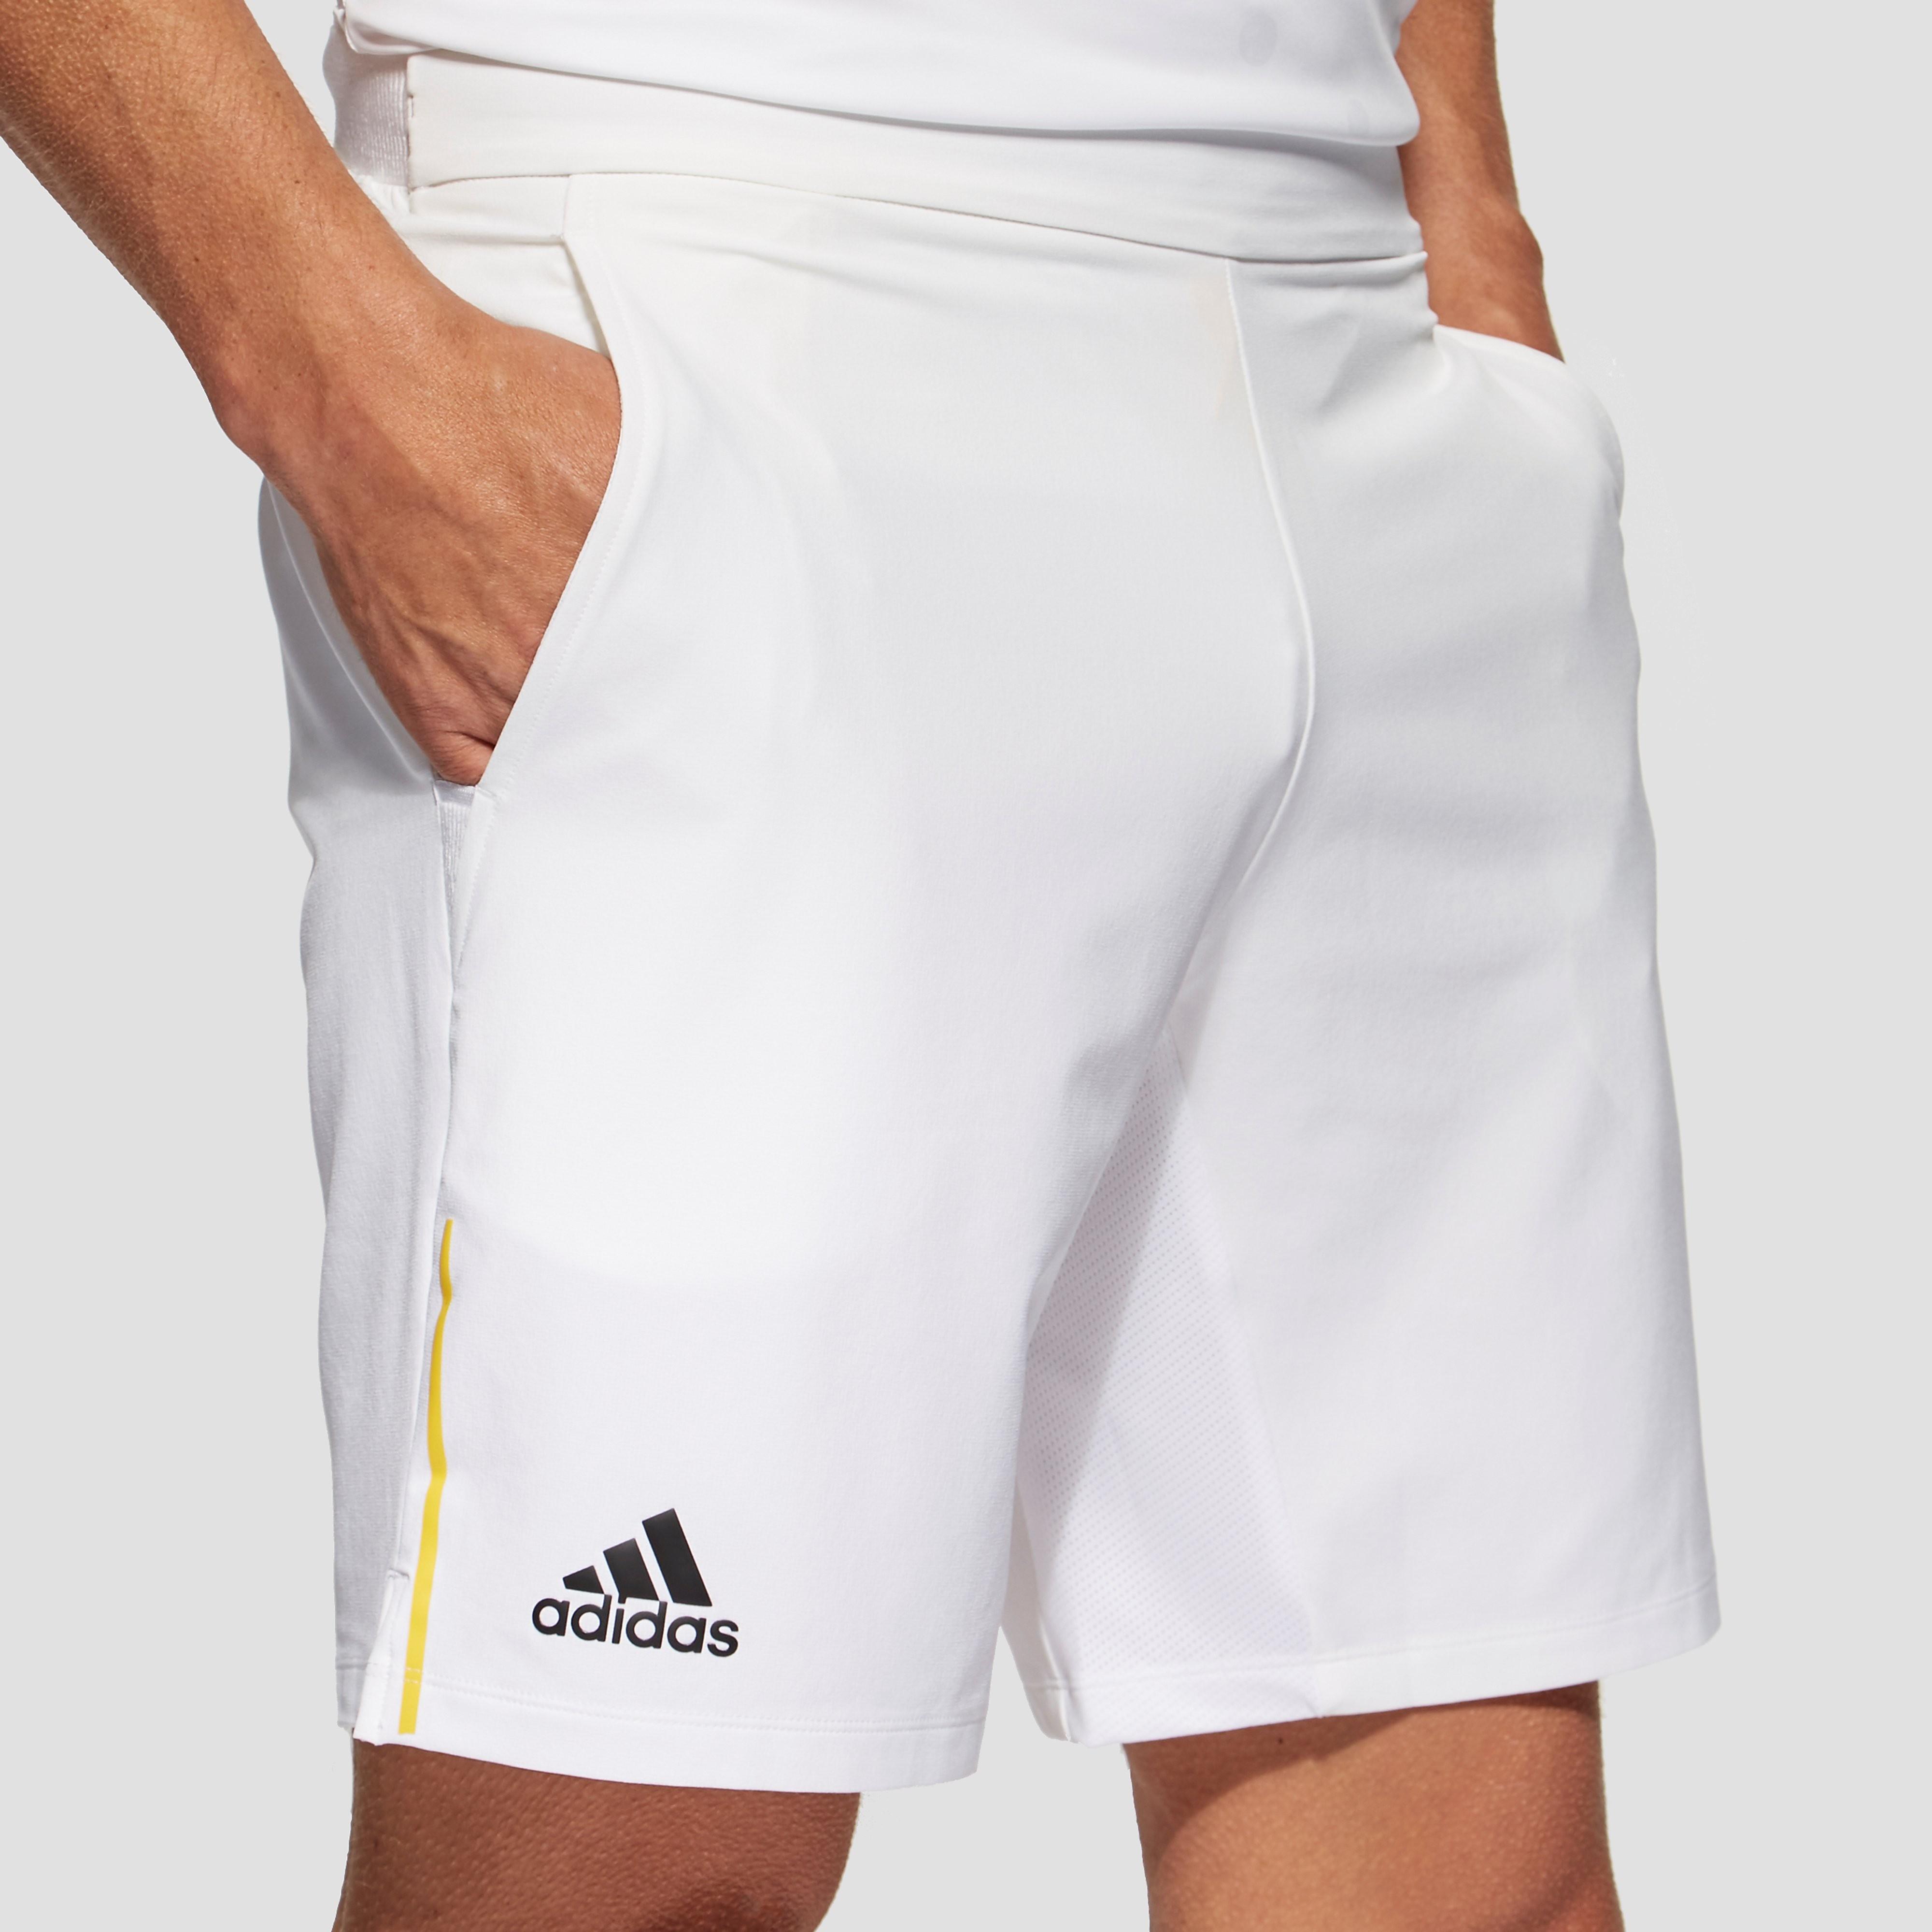 adidas London Men's Tennis Shorts